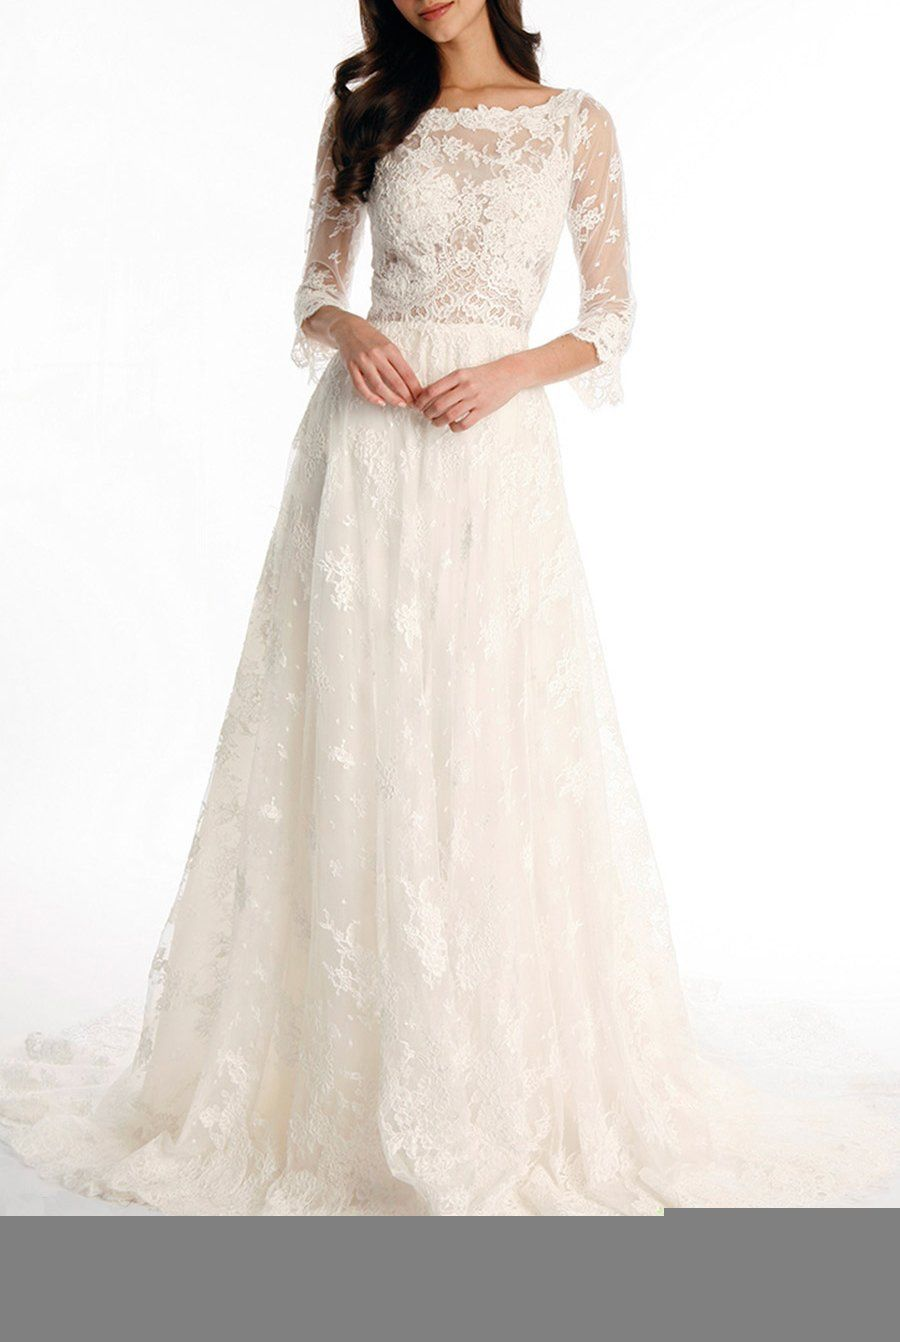 3 4 sleeve lace wedding dress  Tsbridal Lace Wedding Dress   Sleeves Bohemian Wedding